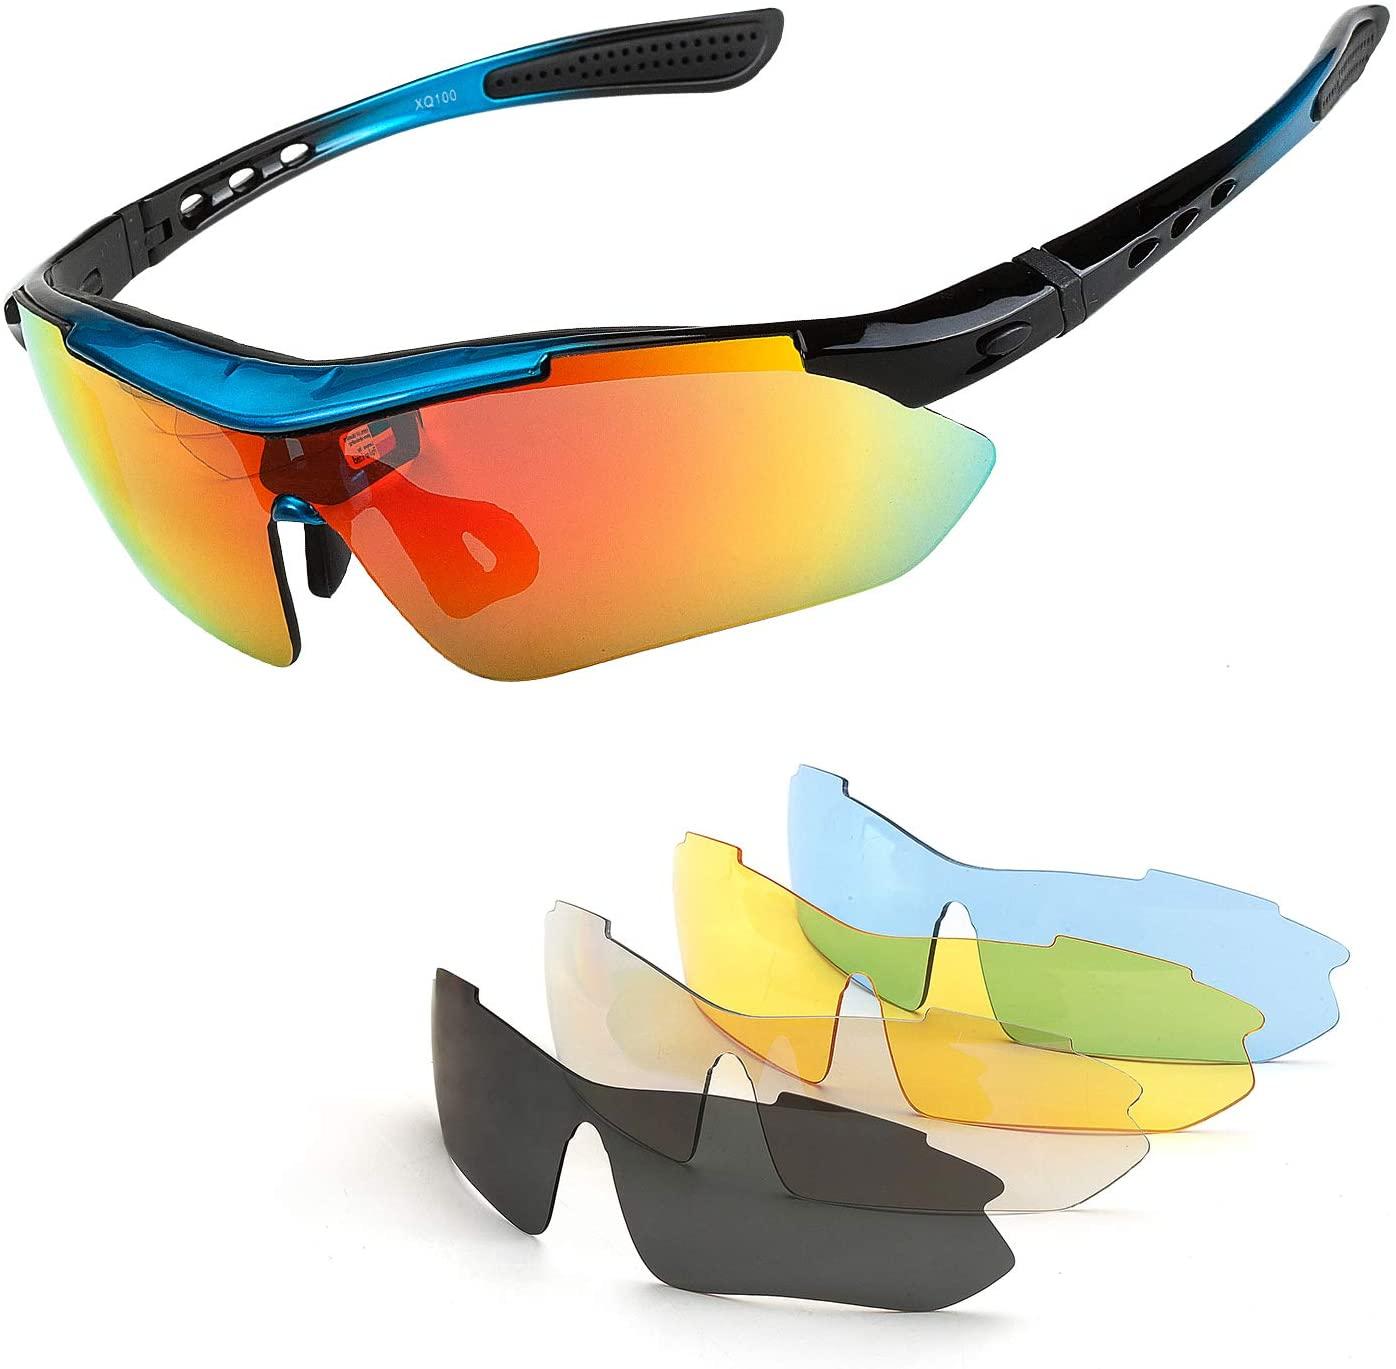 Polarized Sunglass Men Women Sport Driving Cycling Eyewear Fishing Square UV400